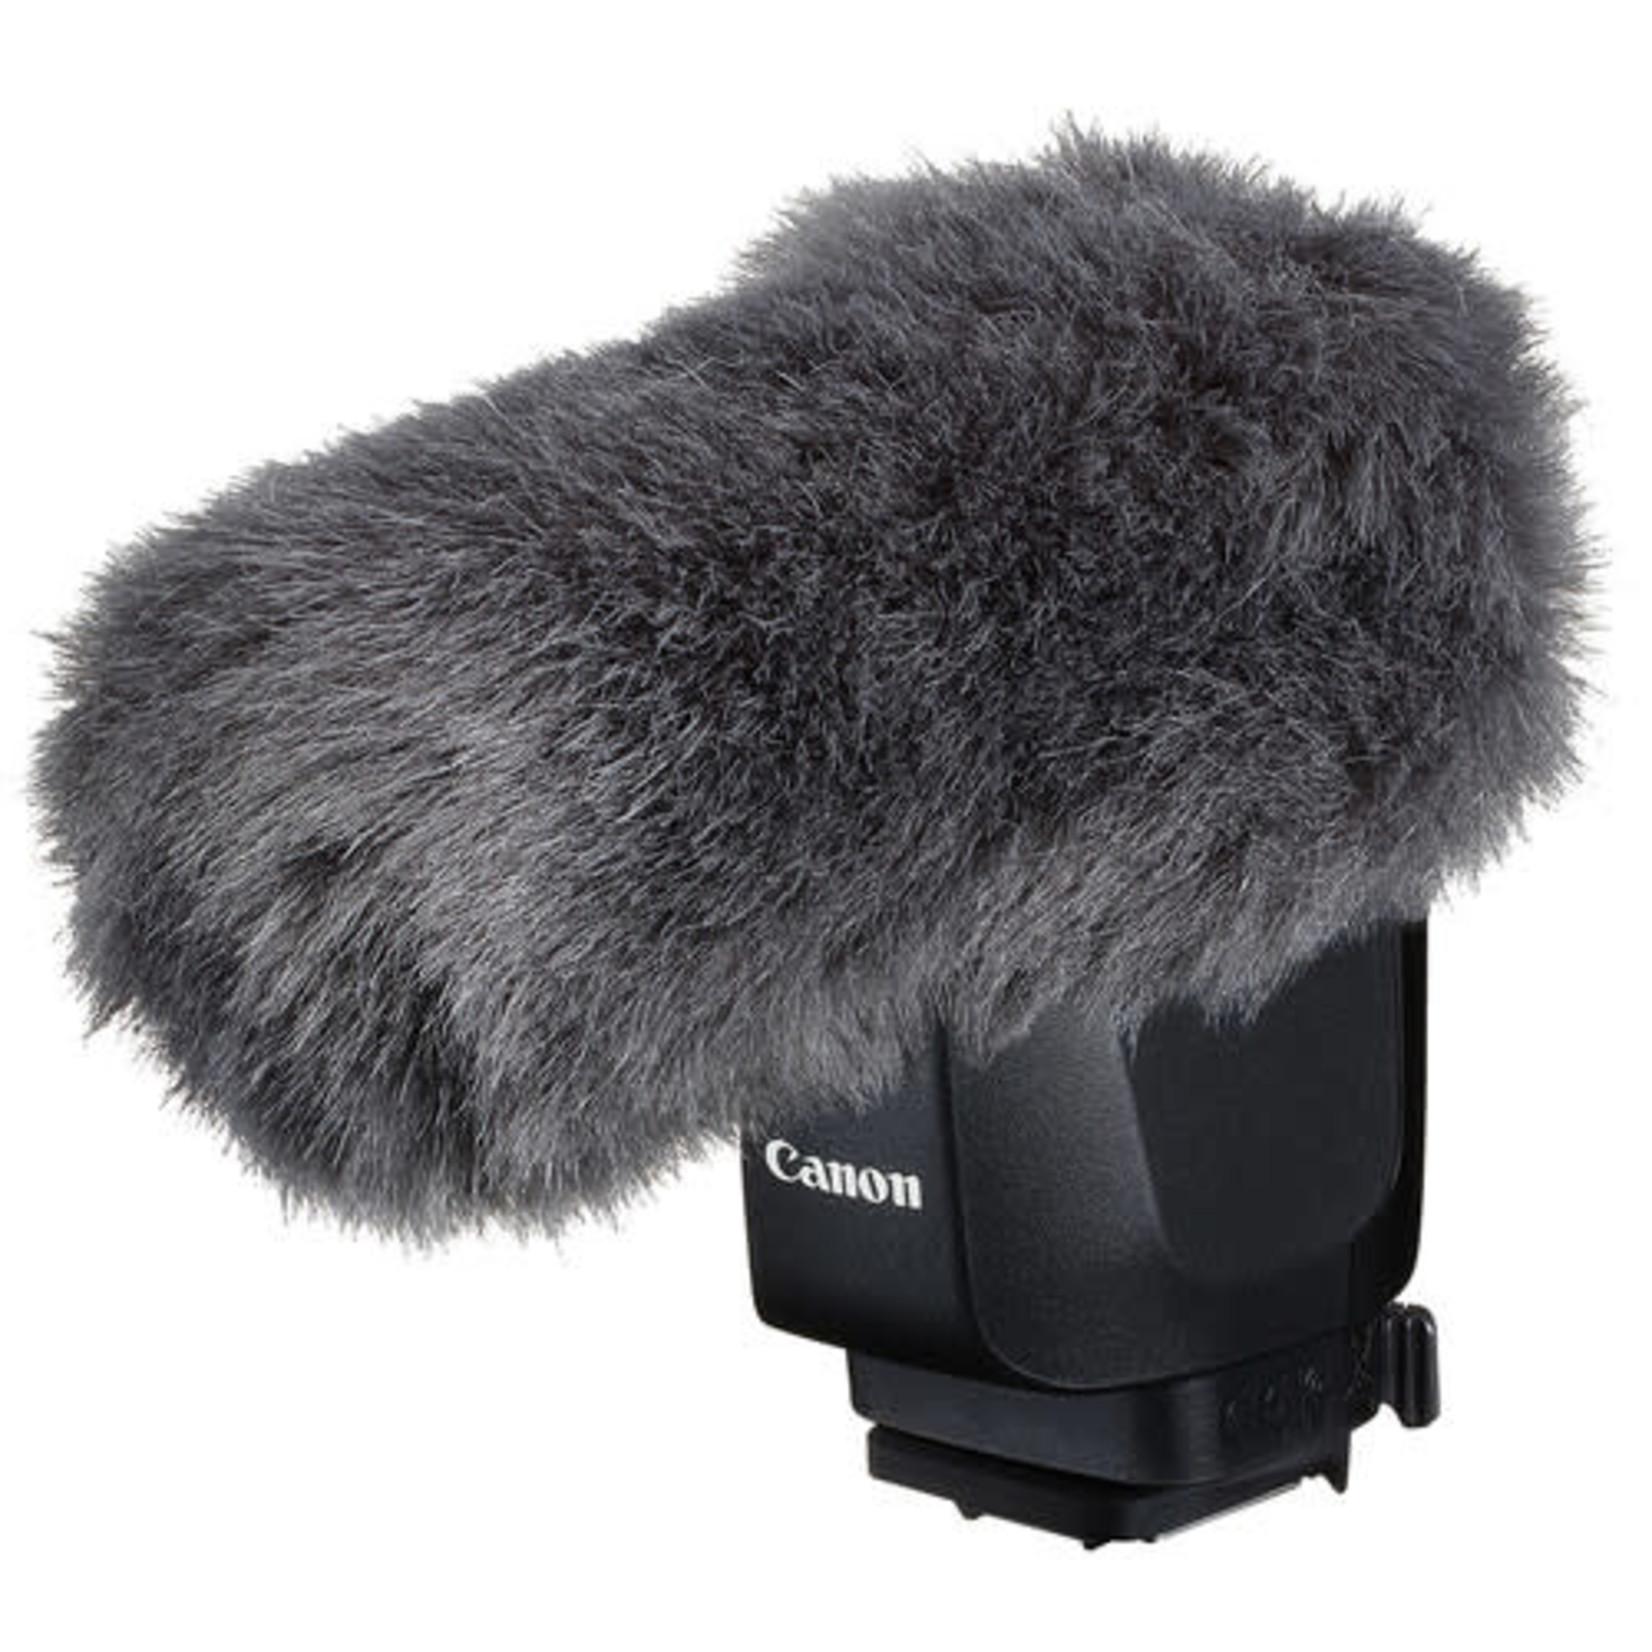 Canon Canon DM-E1D Stereo Microphone